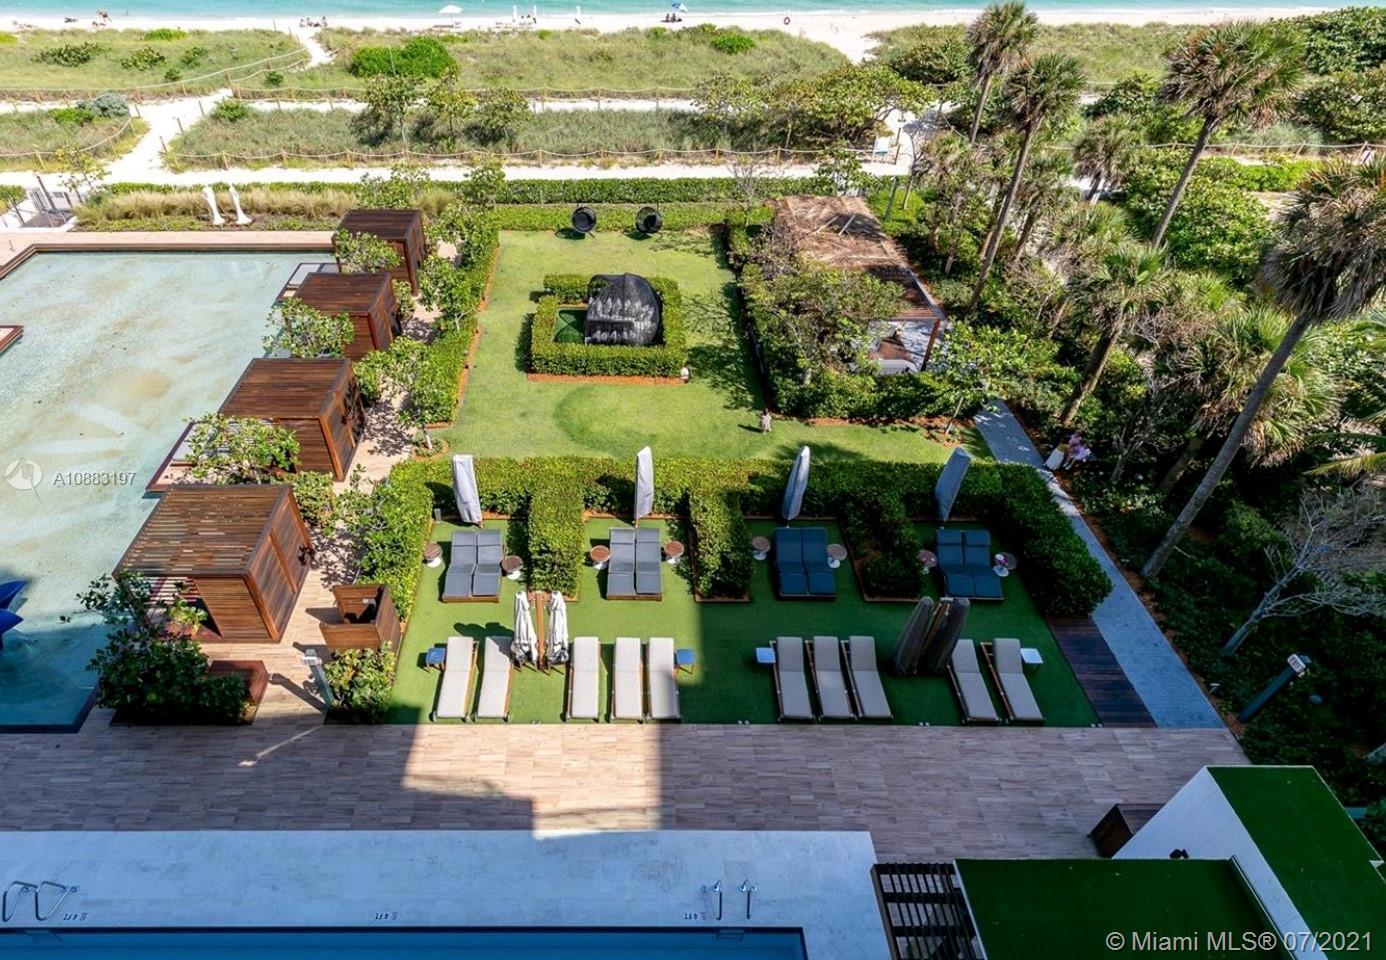 FENDI Chateau Residences, 9349 Collins Ave Unit 506, Surfside, Florida 33154, image 6